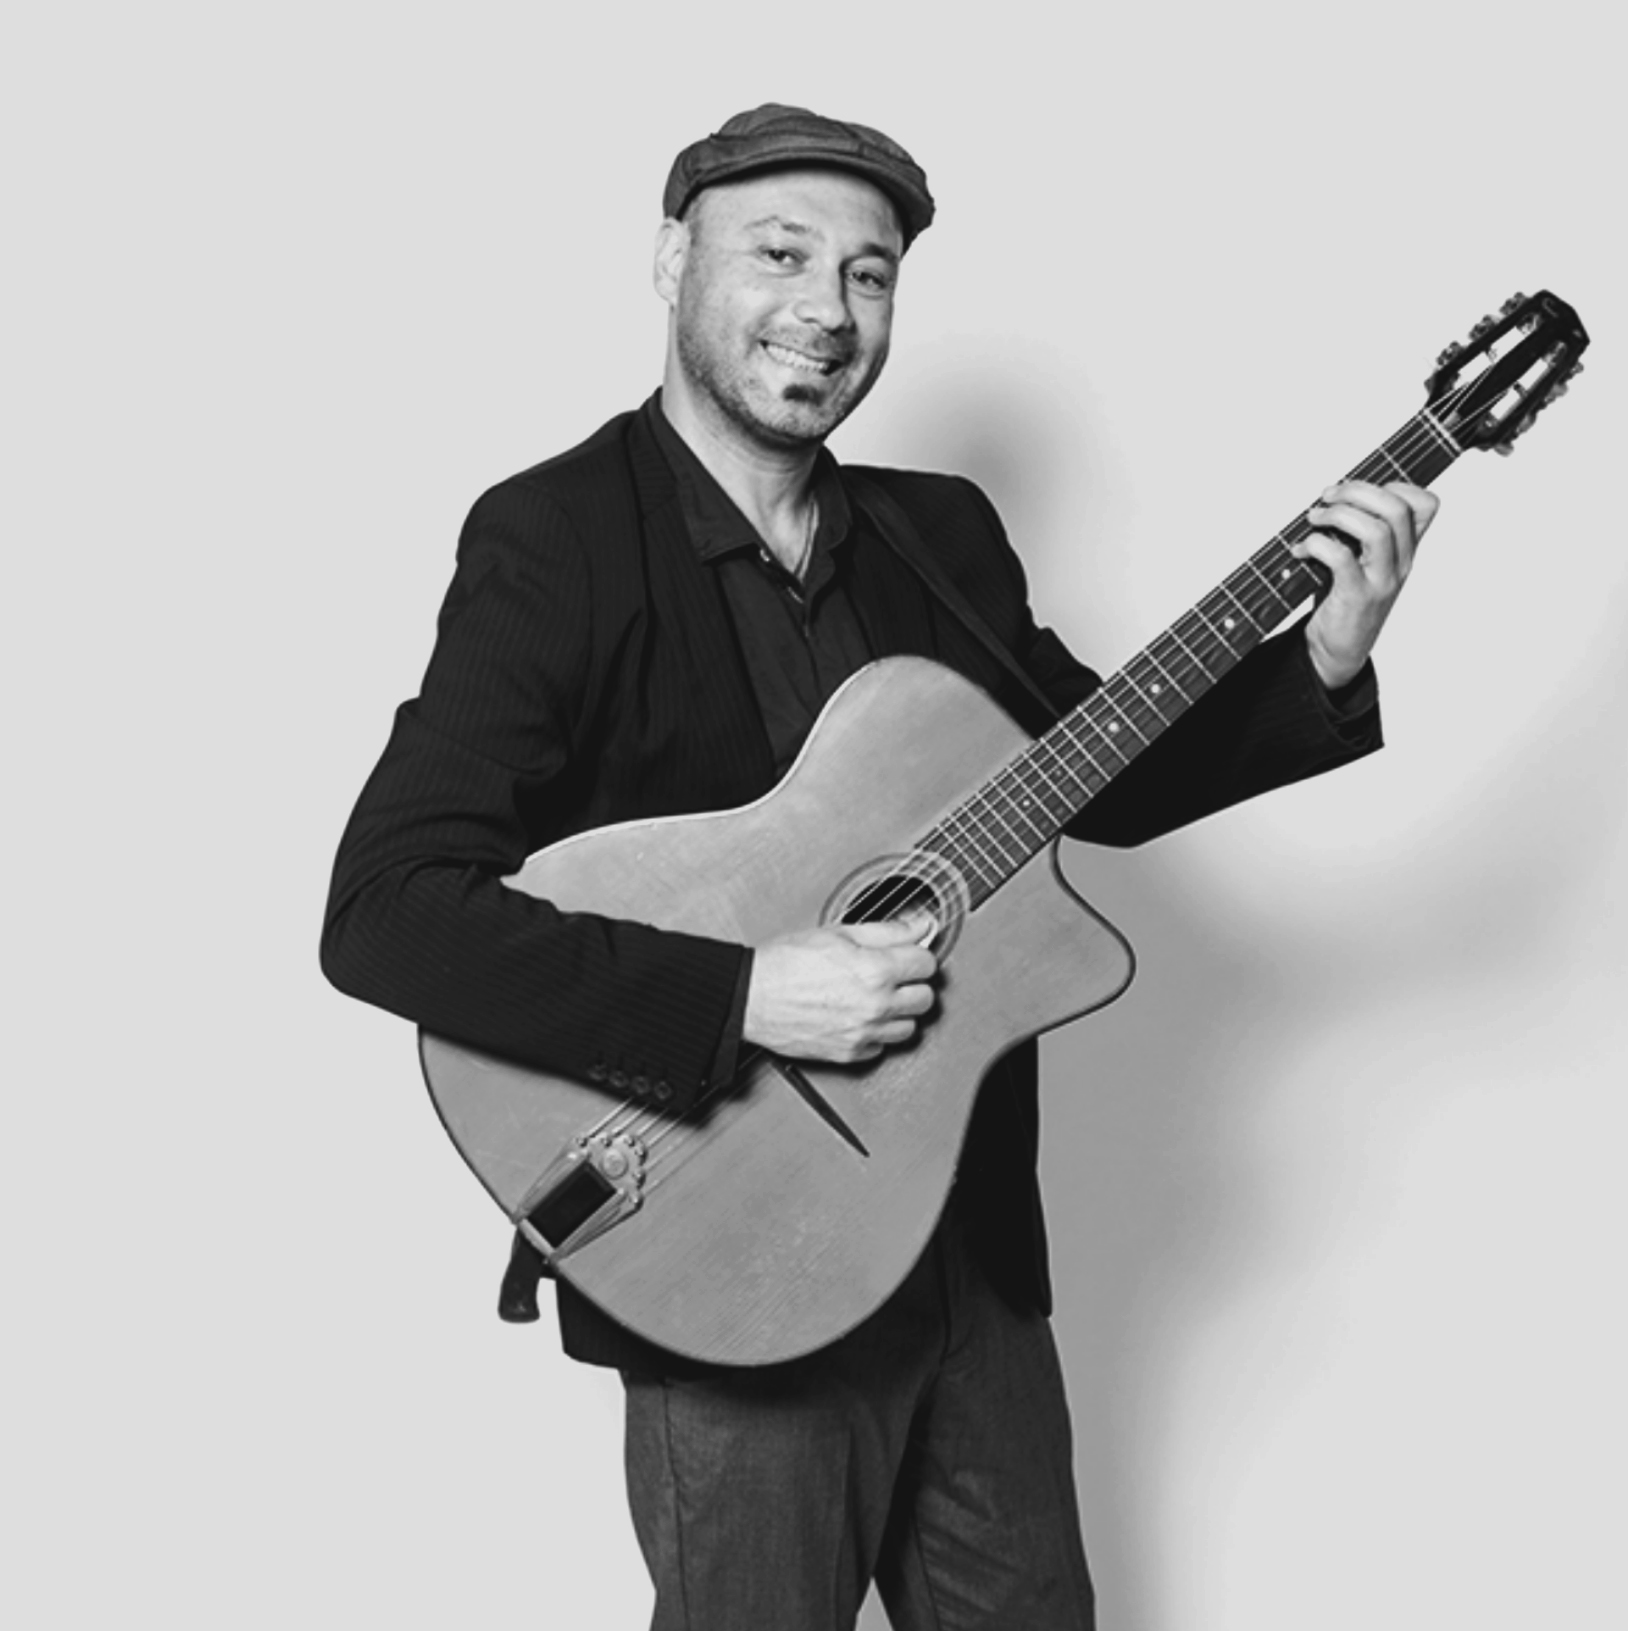 GUITARIST - MICHEL GONZALEZ